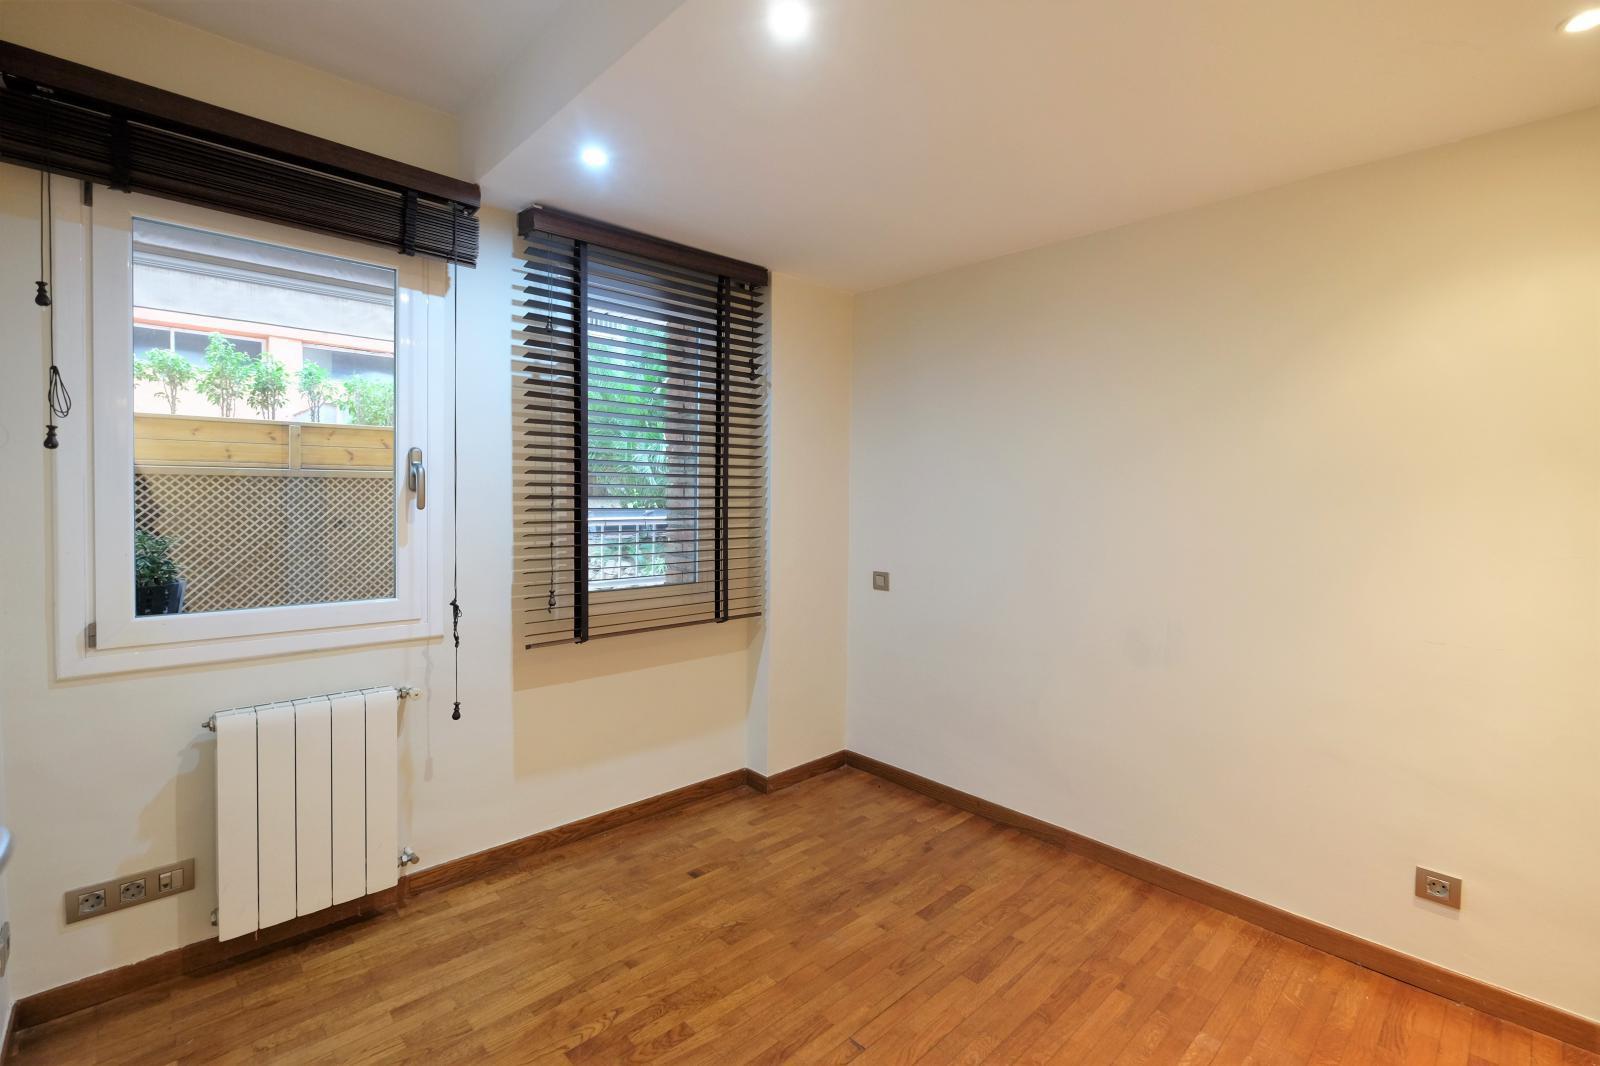 MG Inmobiliaria Barcelona - piso-raset-vistas-despejadas